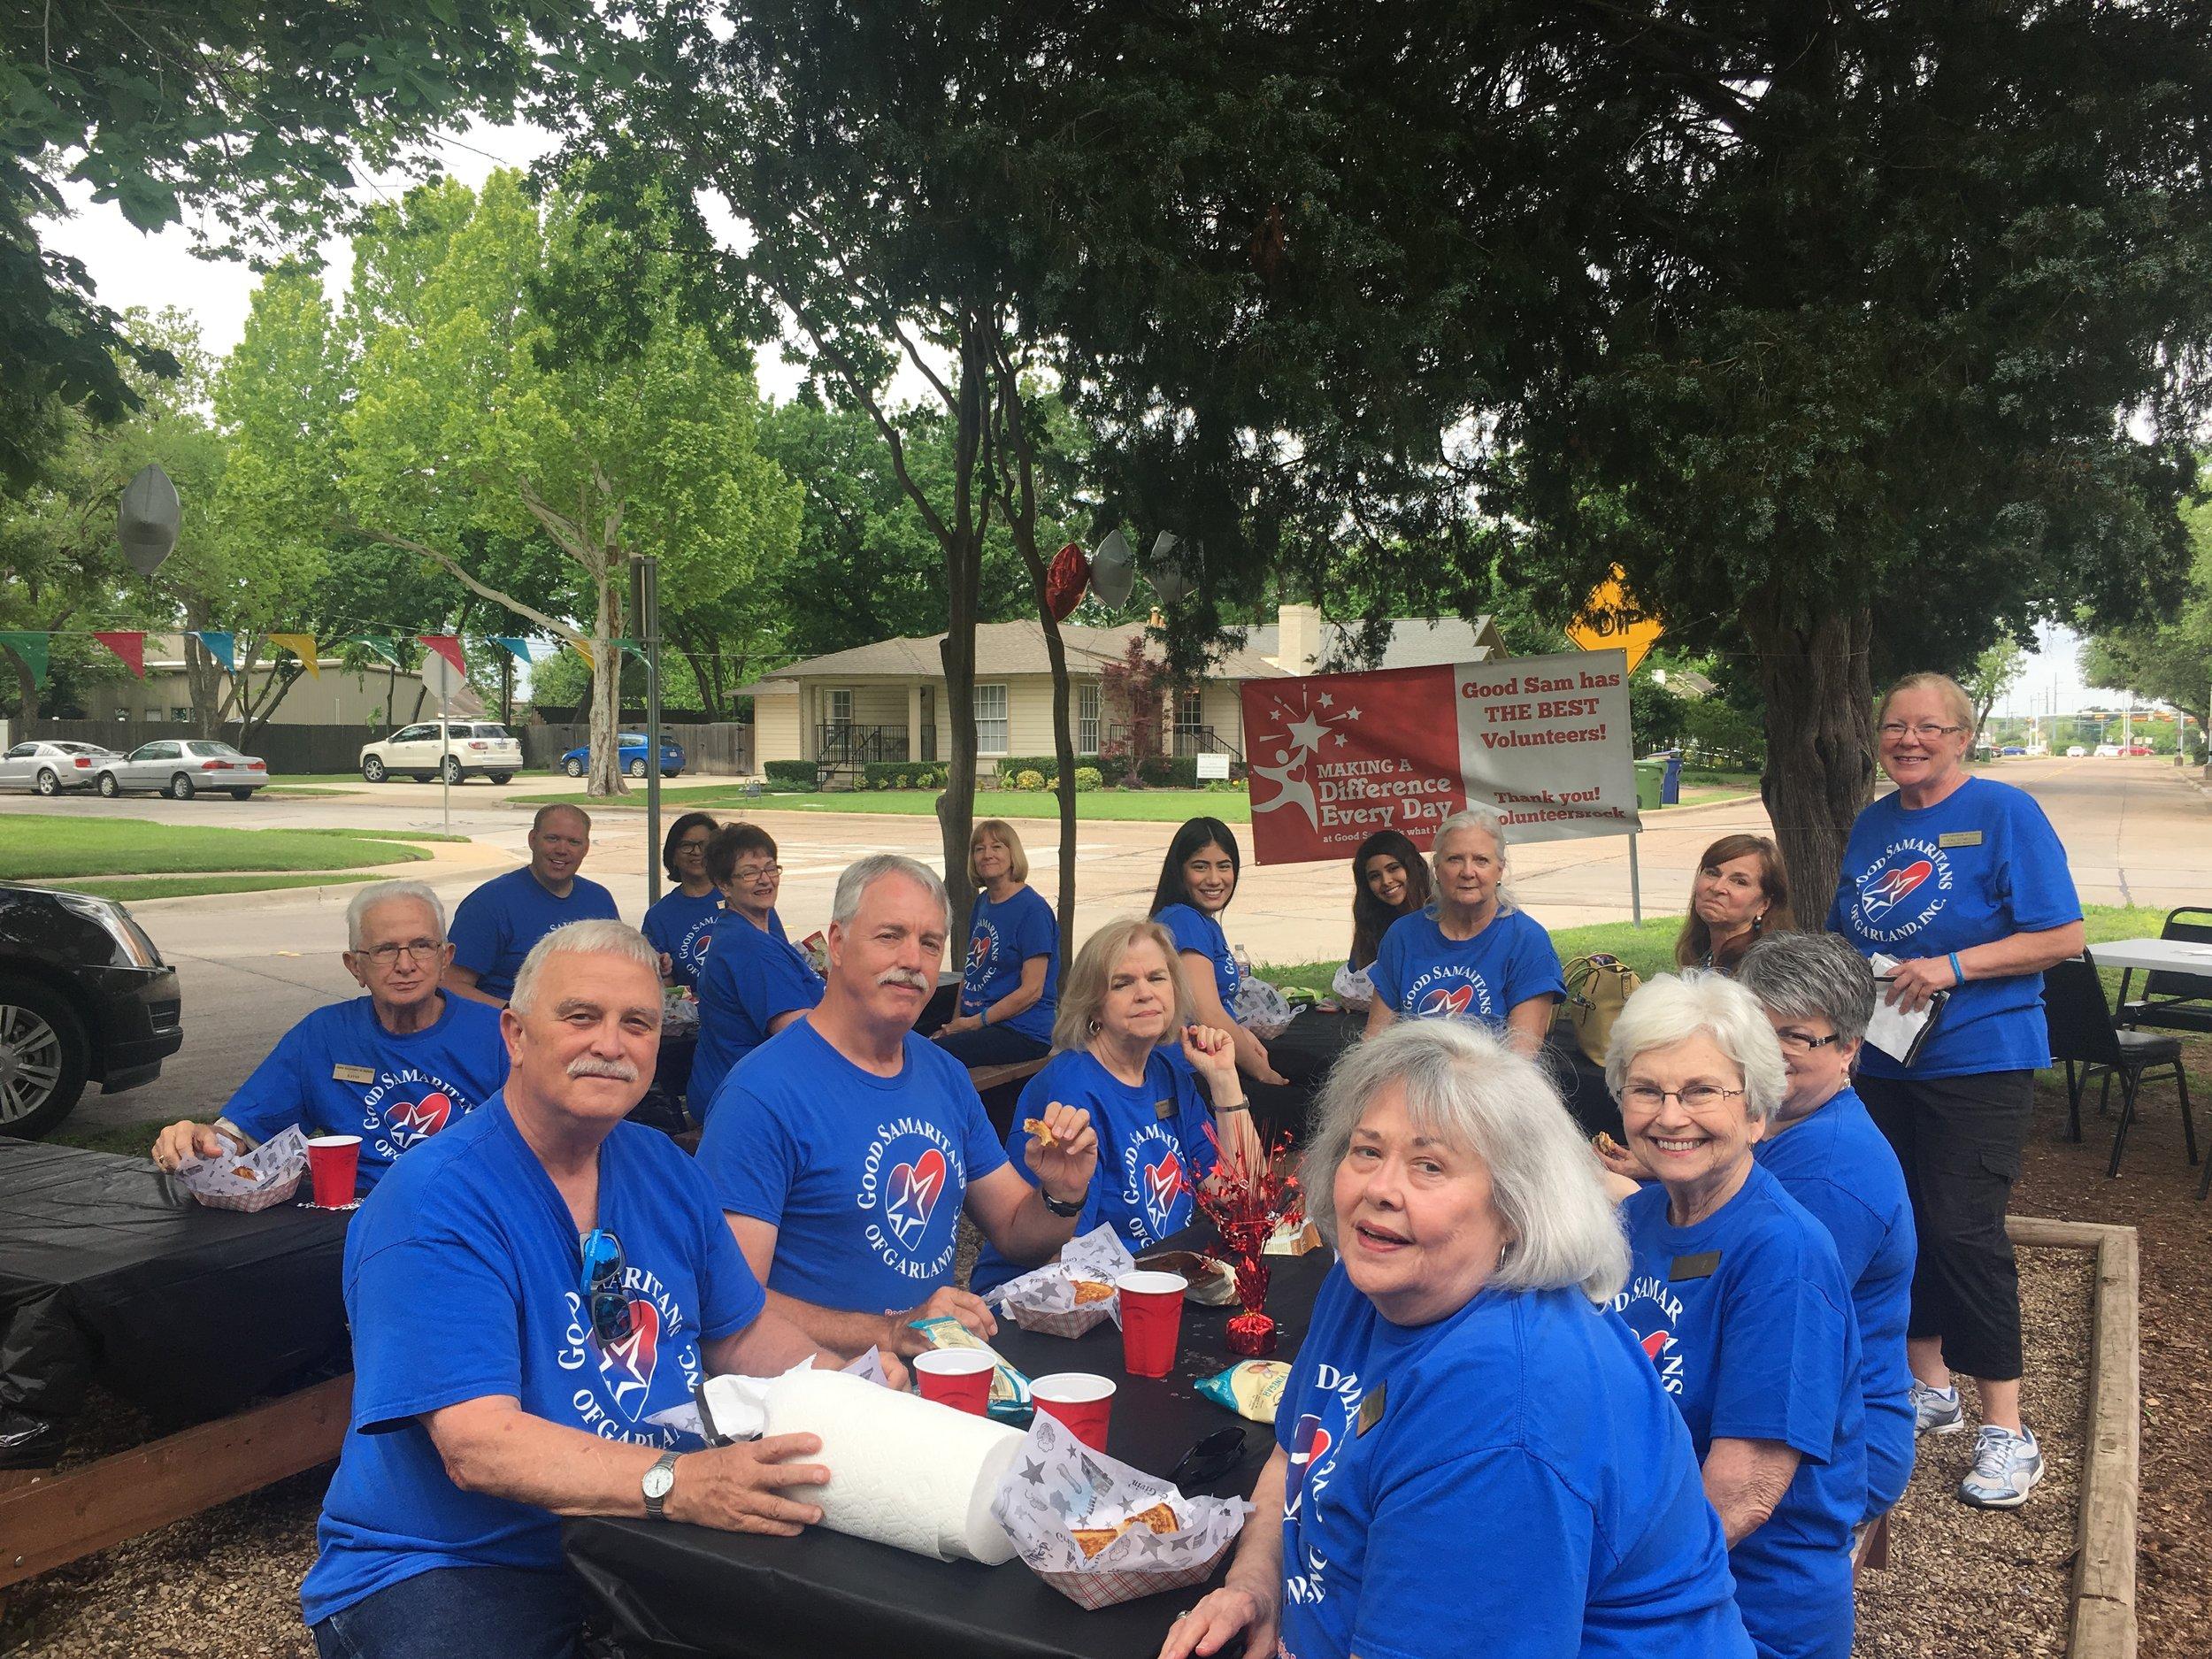 Good Samaritans of Garland, Inc